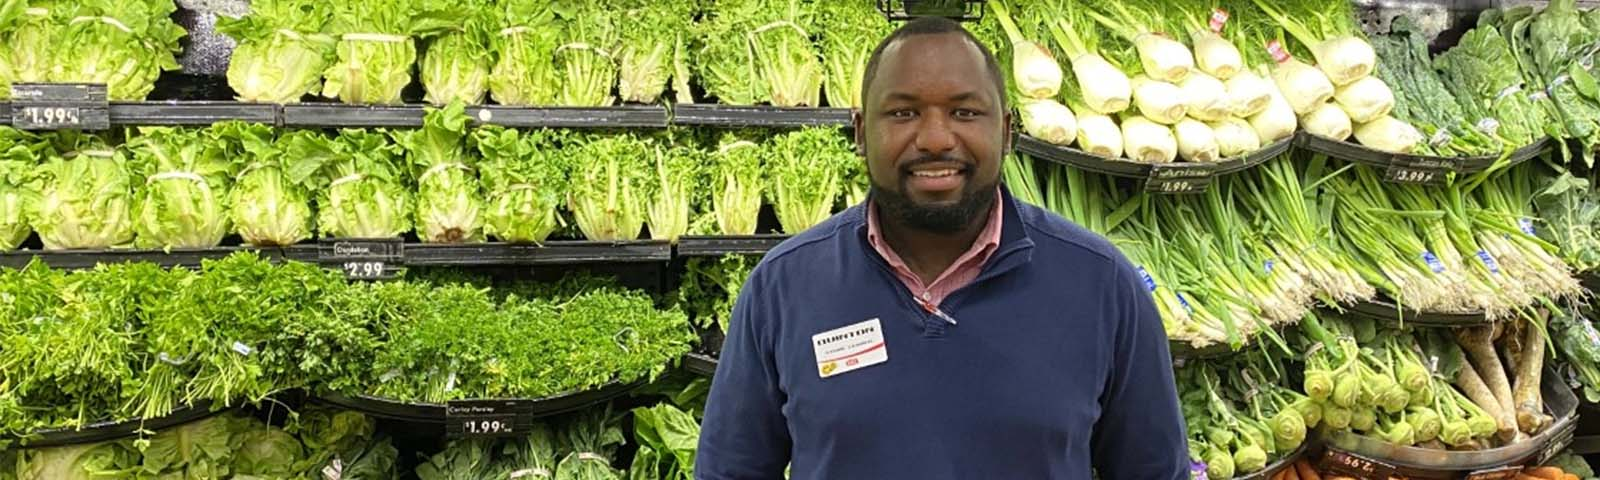 #TeamMemberTuesday<br><b>Meet Quinton, Store Leader</b>